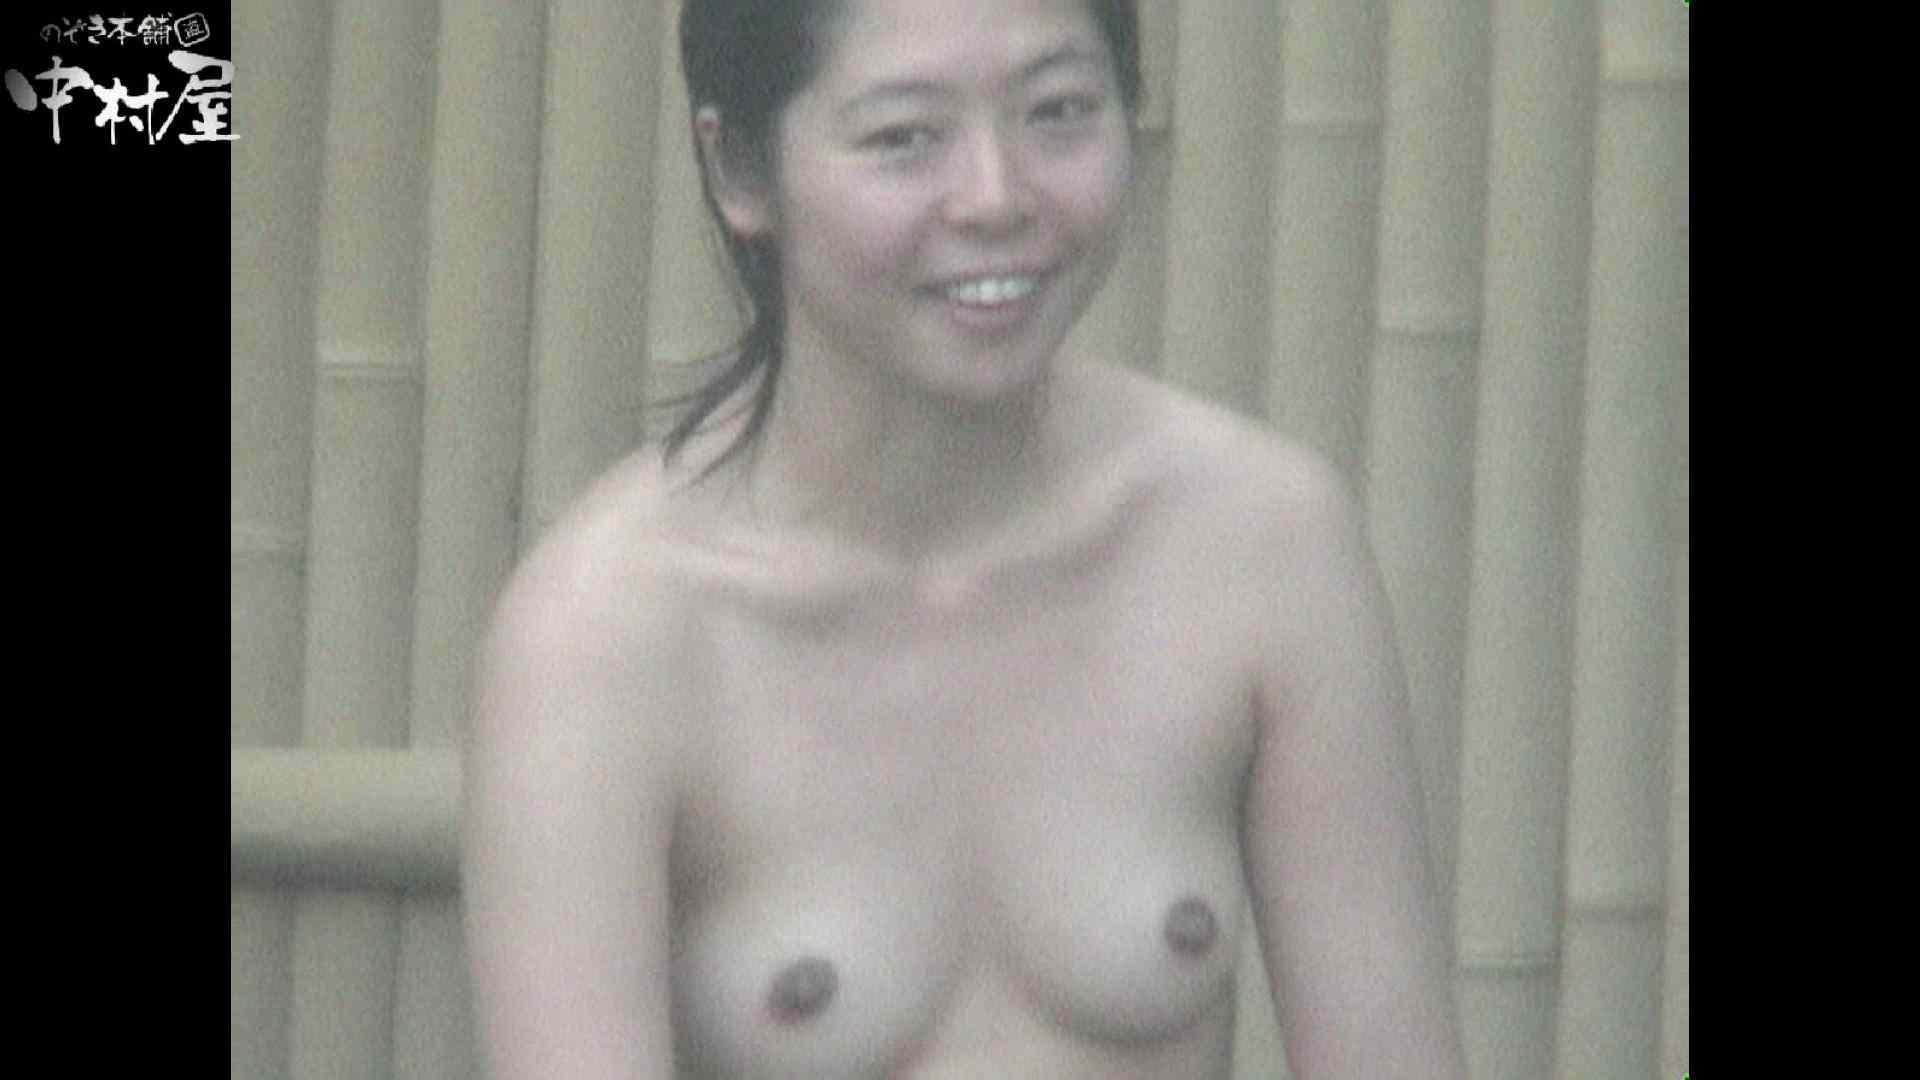 Aquaな露天風呂Vol.932 盗撮師作品   露天風呂突入  106pic 10